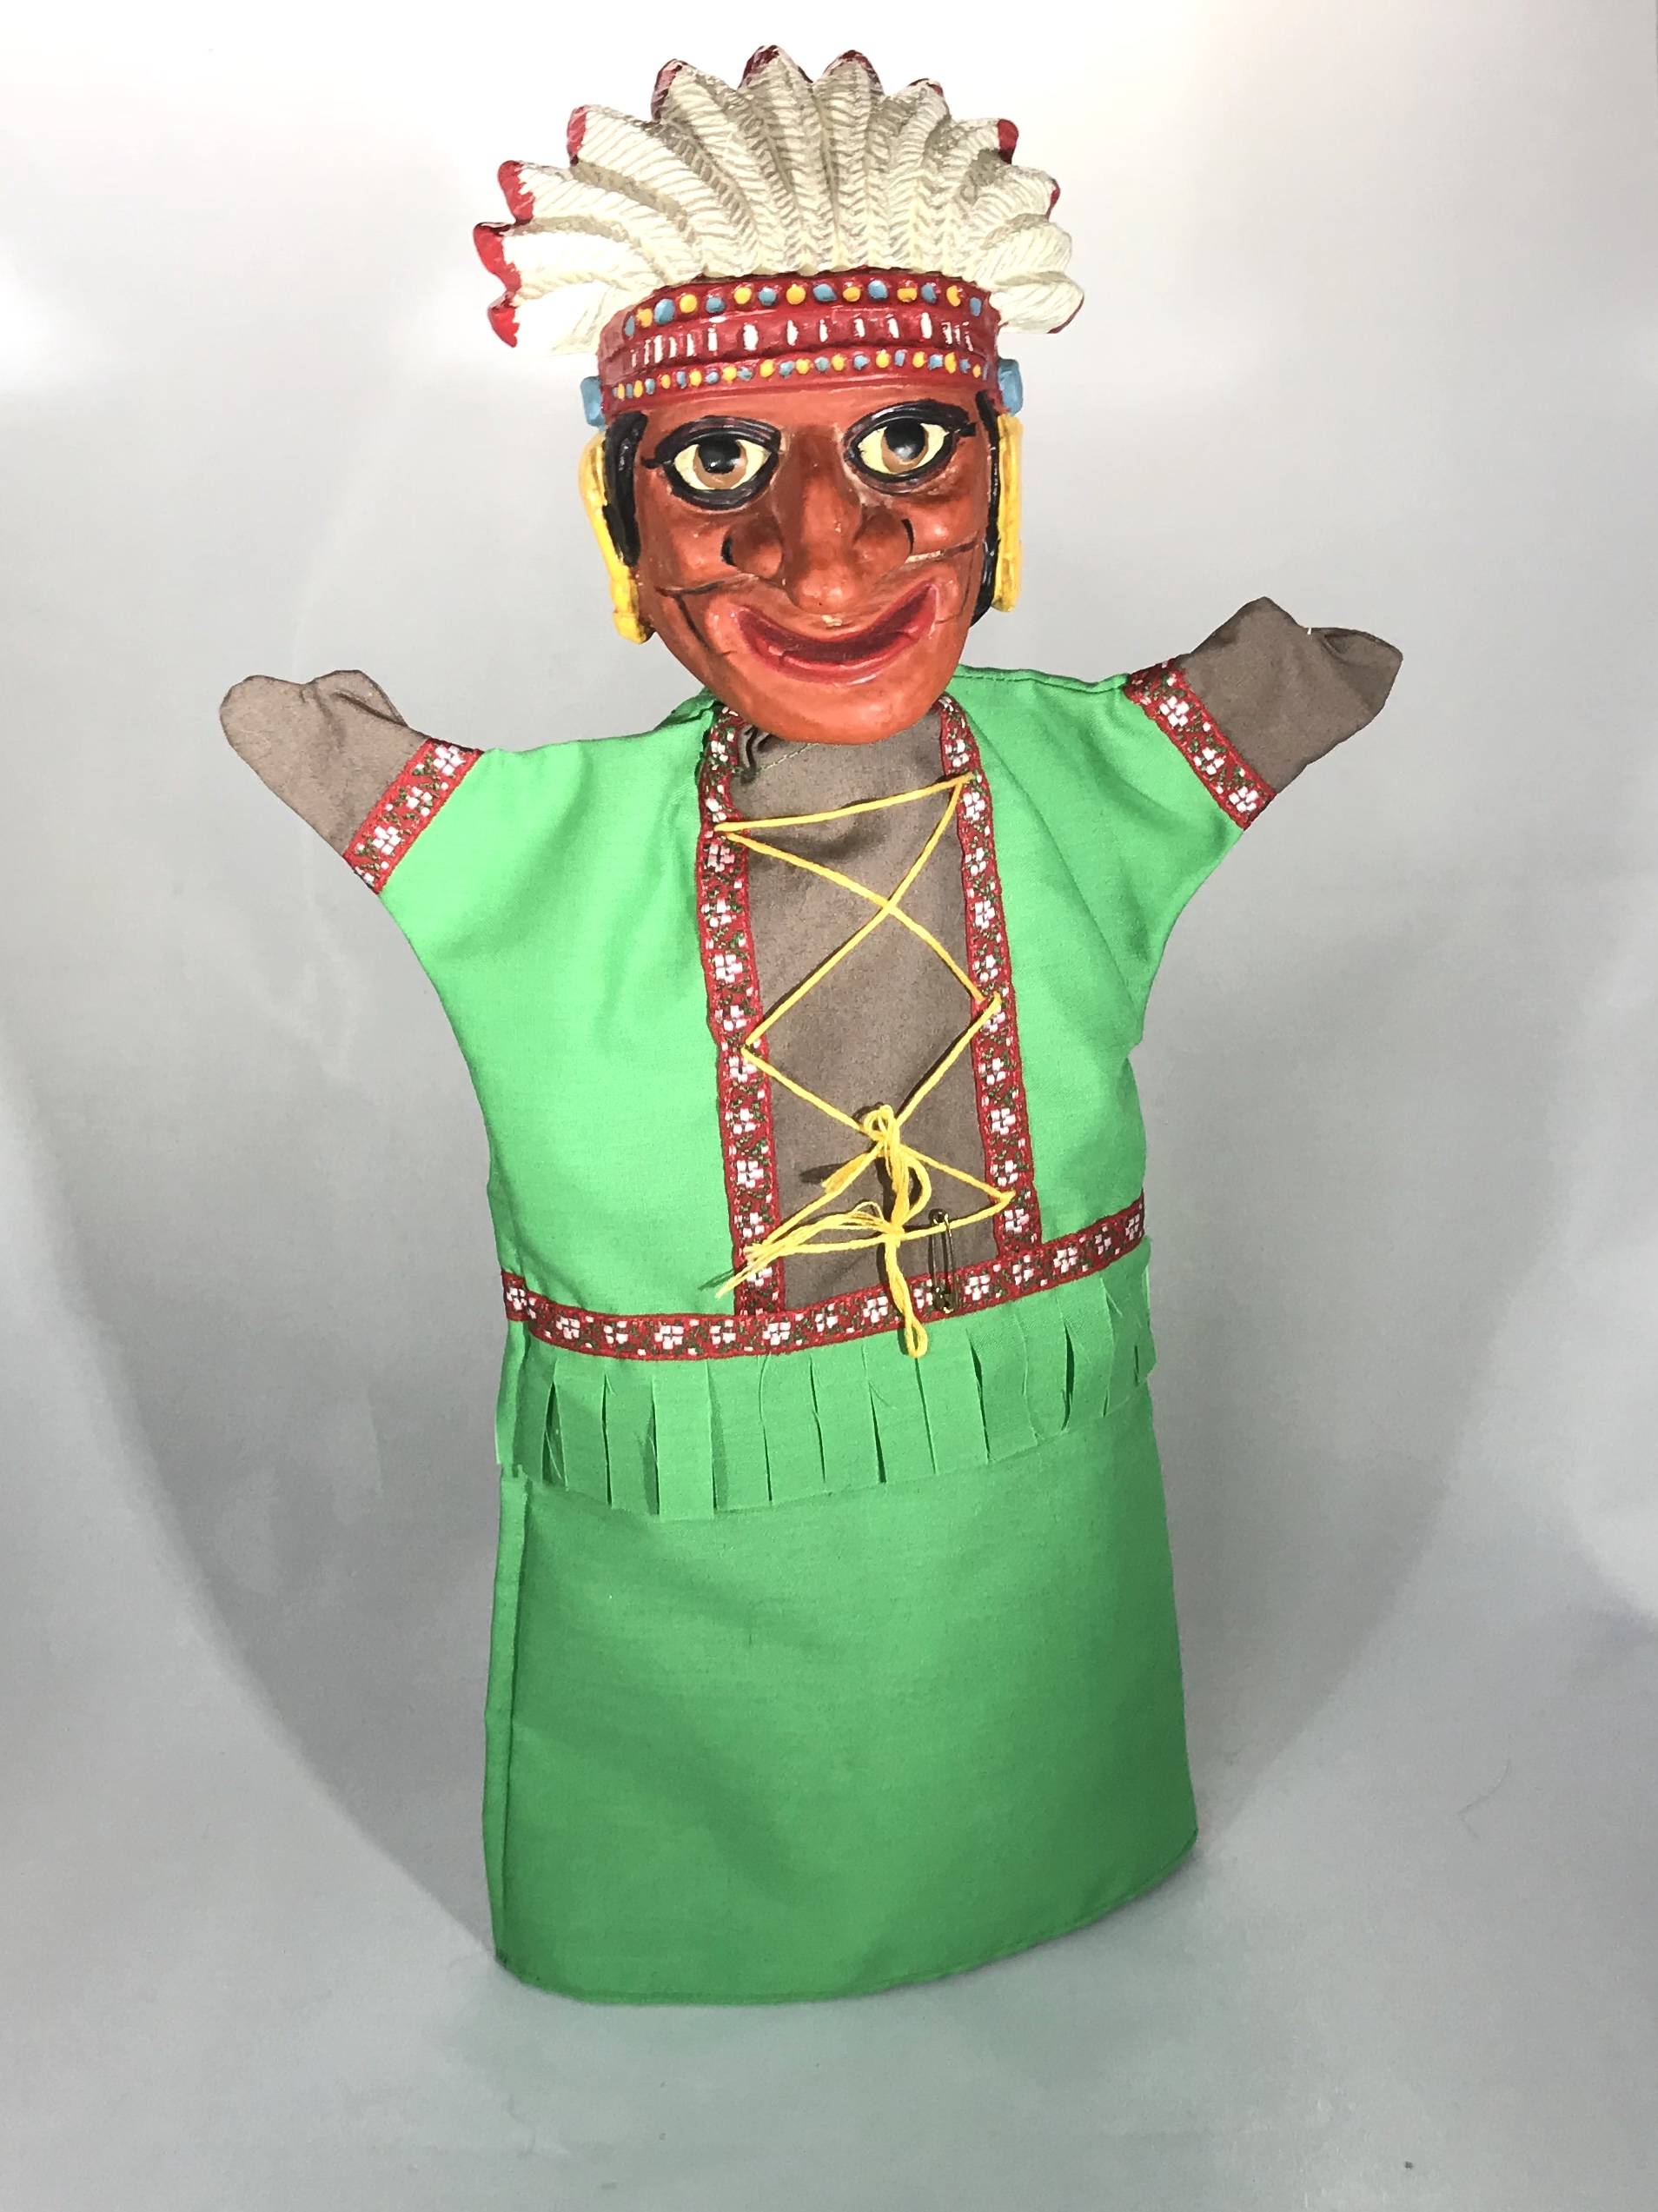 Glove Chieftan